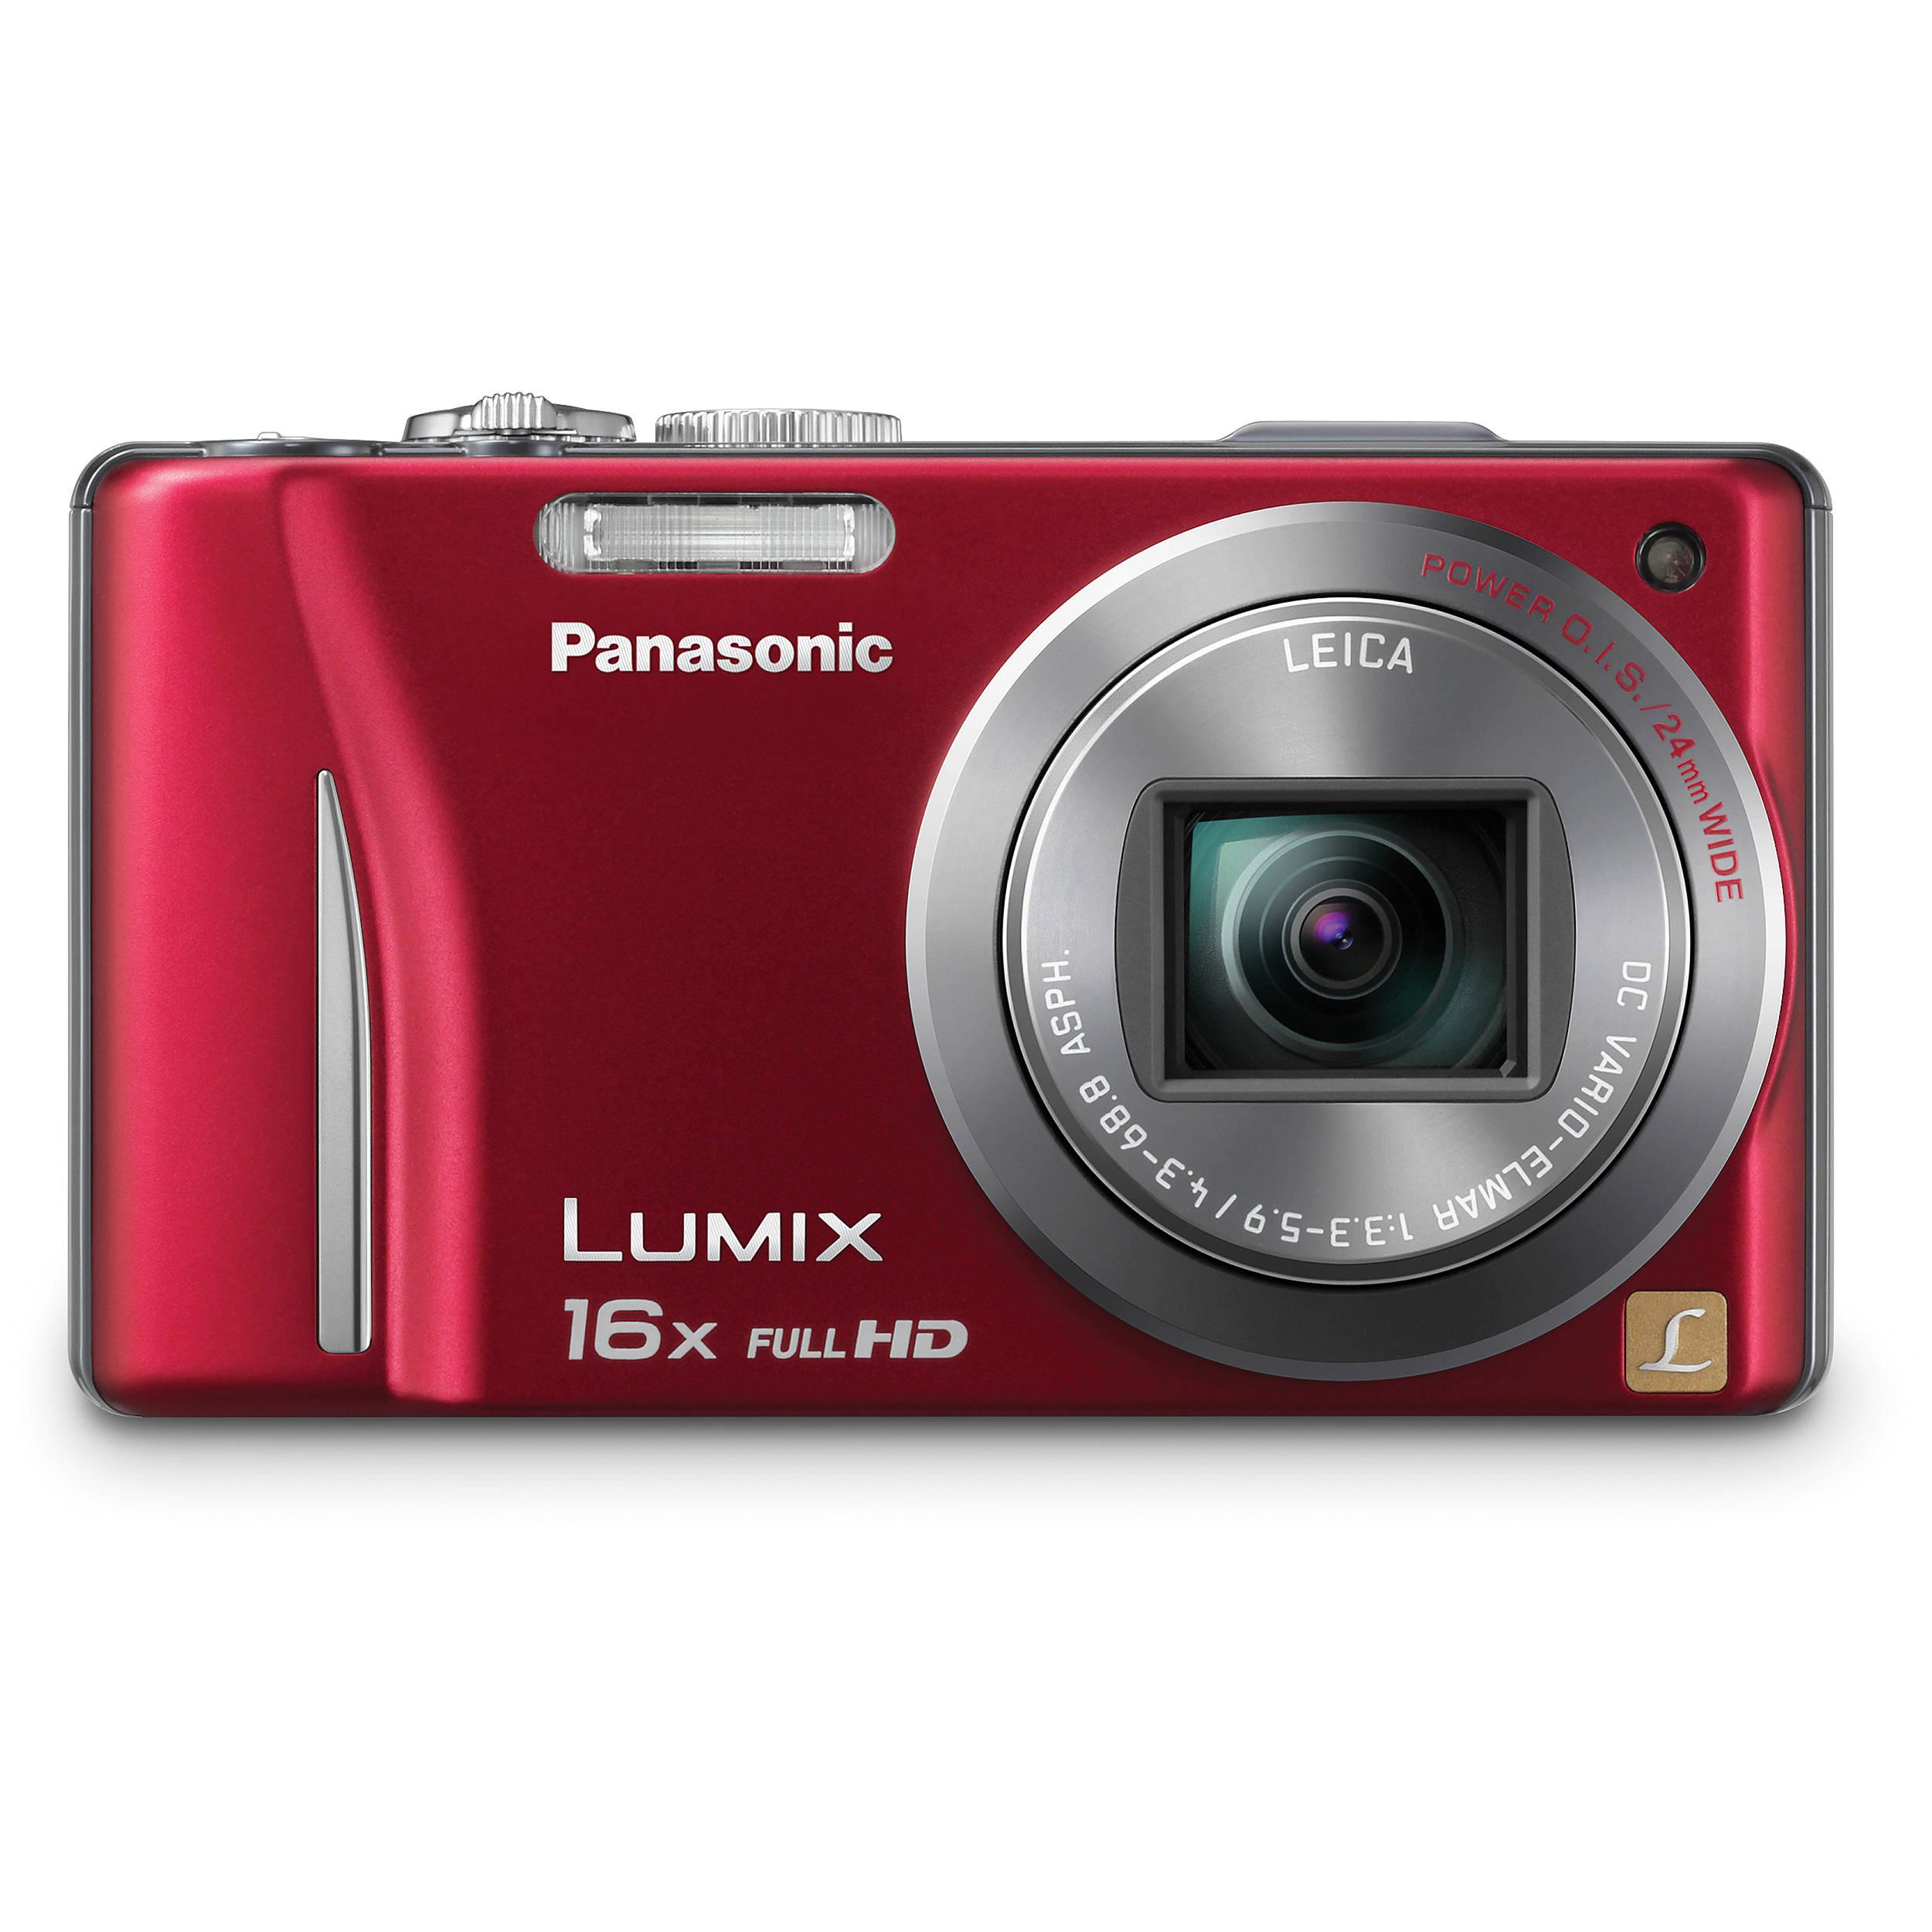 Panasonic Lumix DMC-ZS10 Digital Camera (Red)